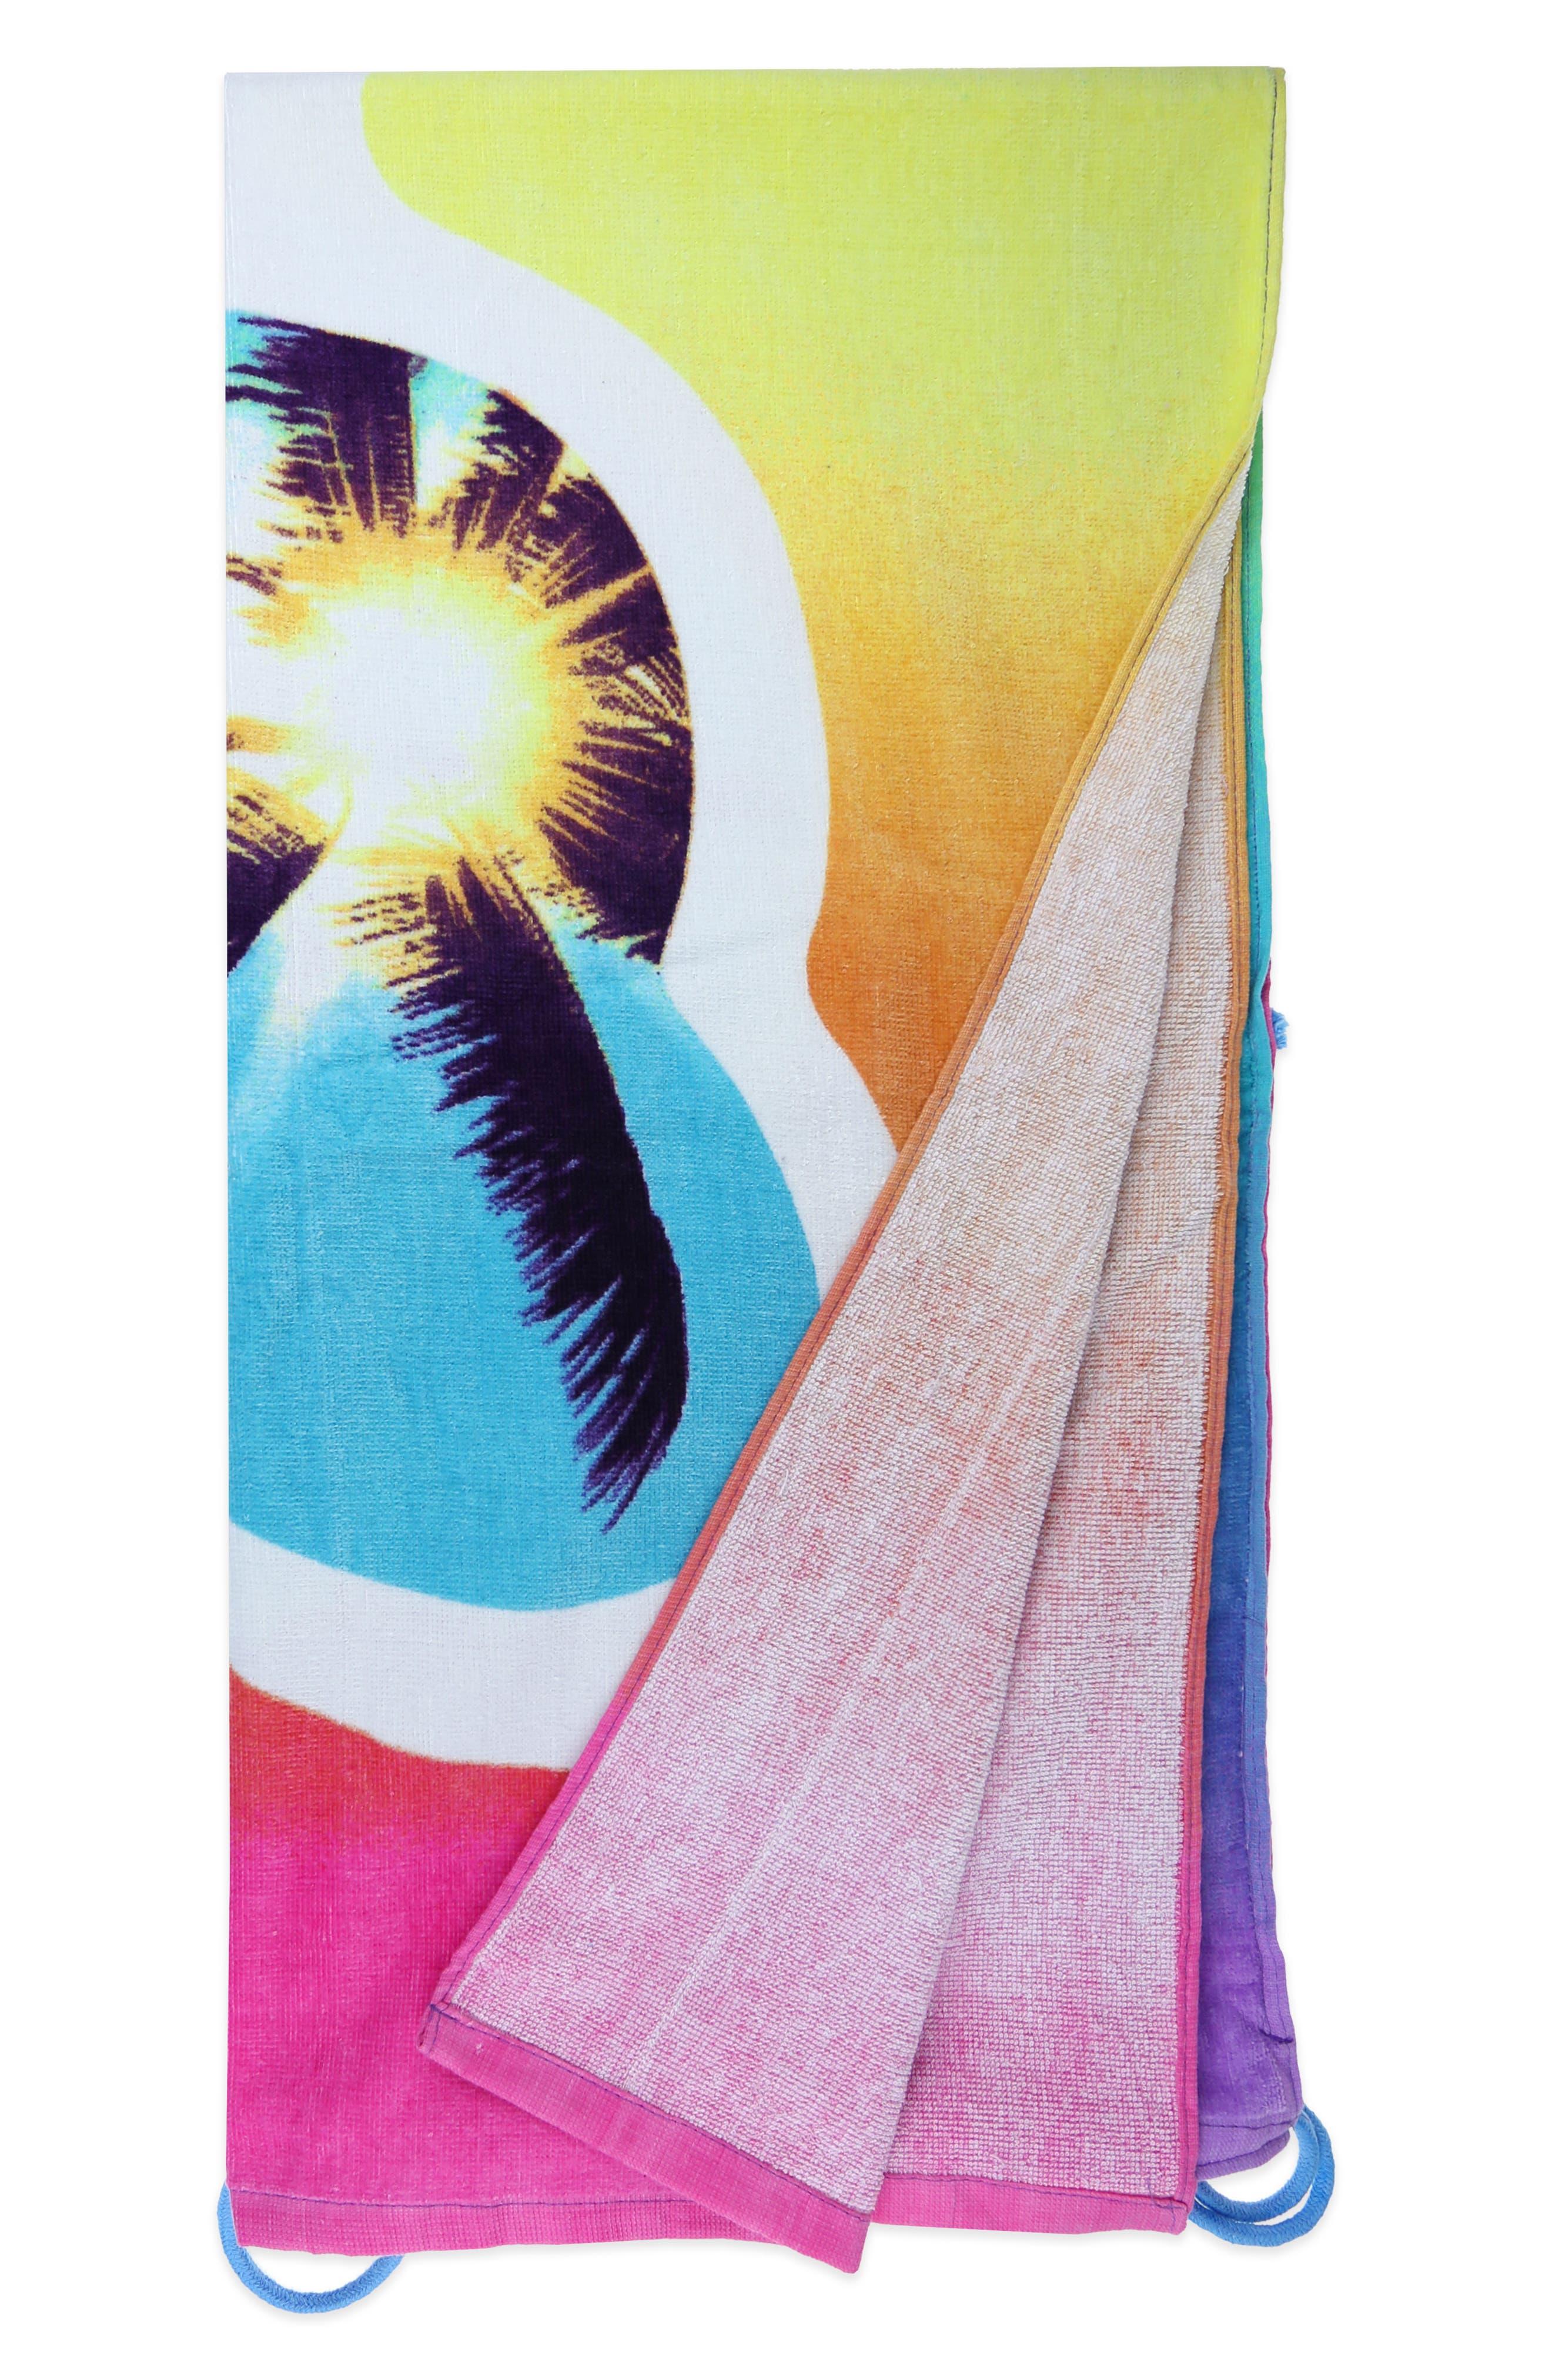 Heart Sunnies Towel Backpack,                             Alternate thumbnail 8, color,                             475